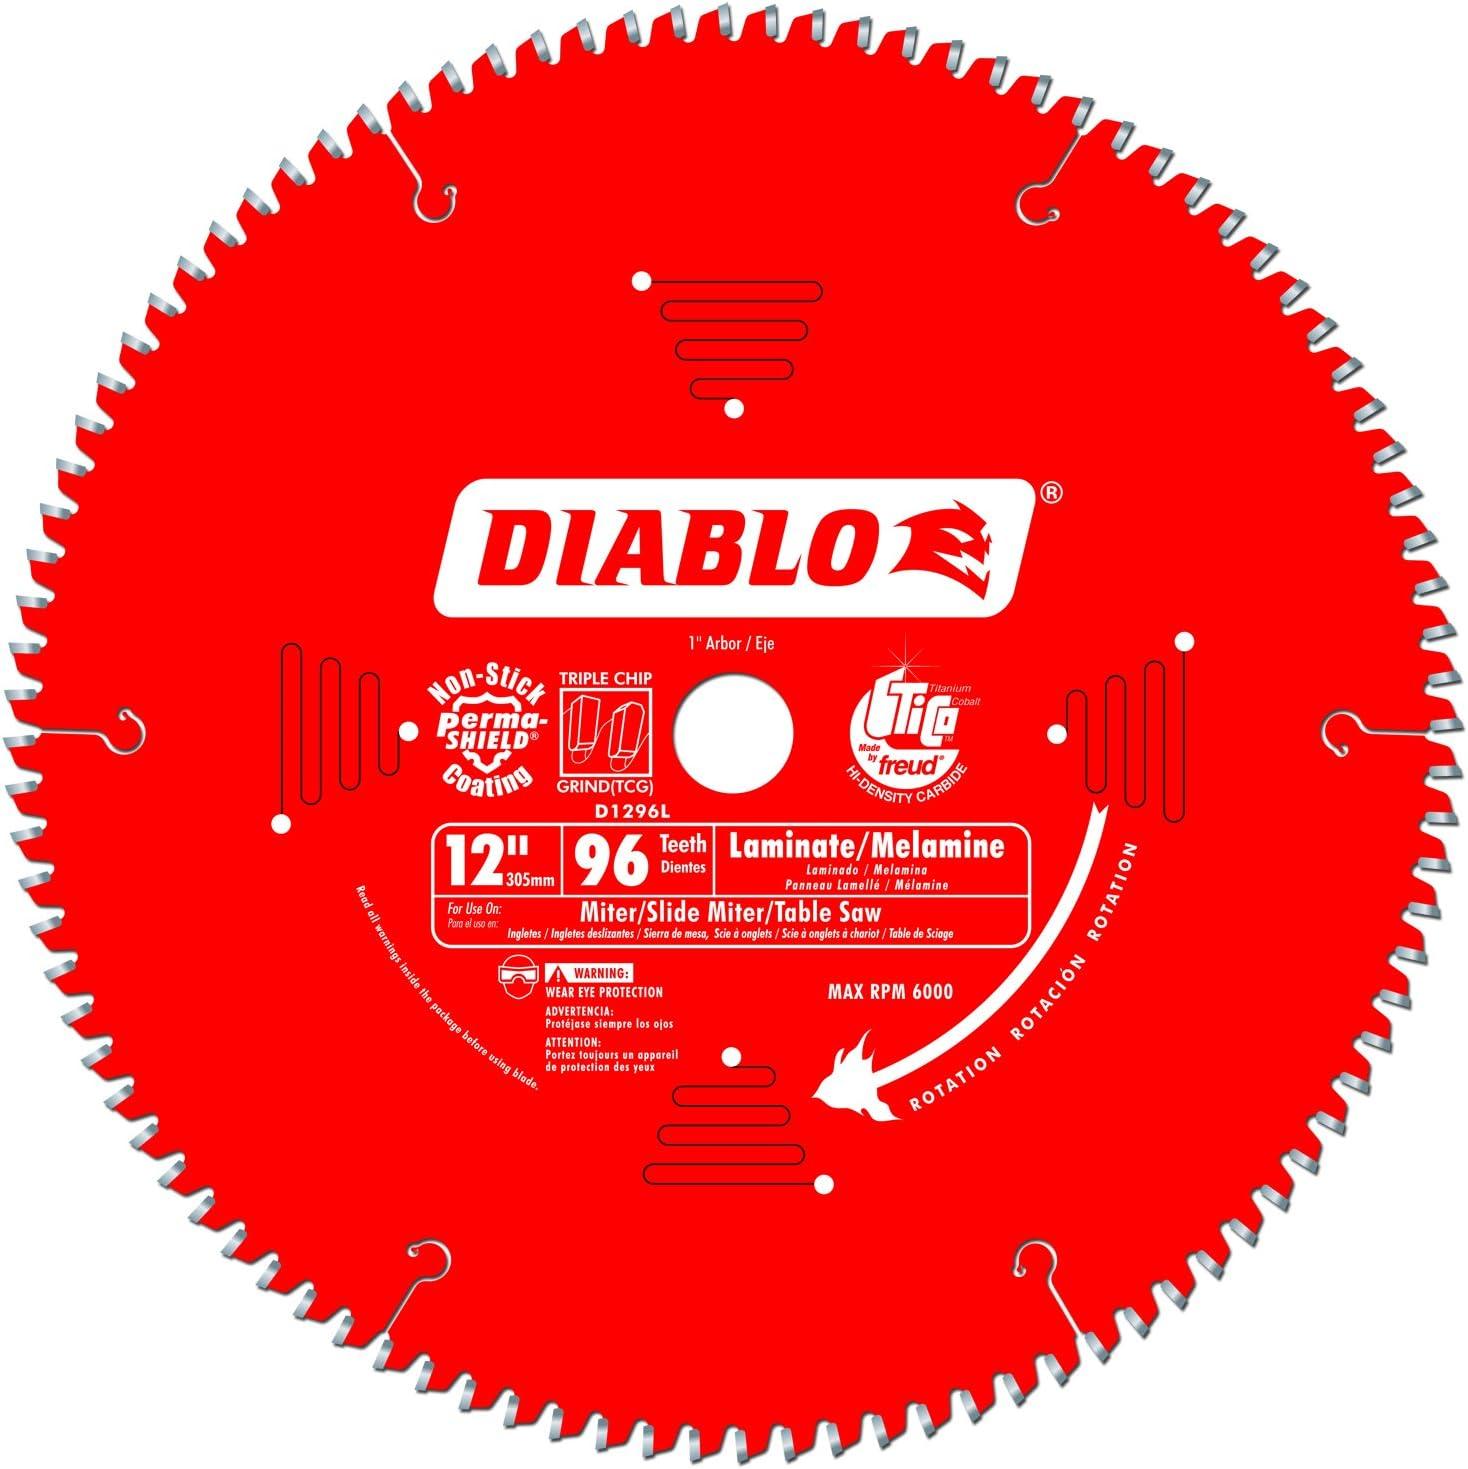 Freud D1296L Diablo Max 55% OFF Melamine Laminate Saw and Sales results No. 1 Flooring Bl Wood